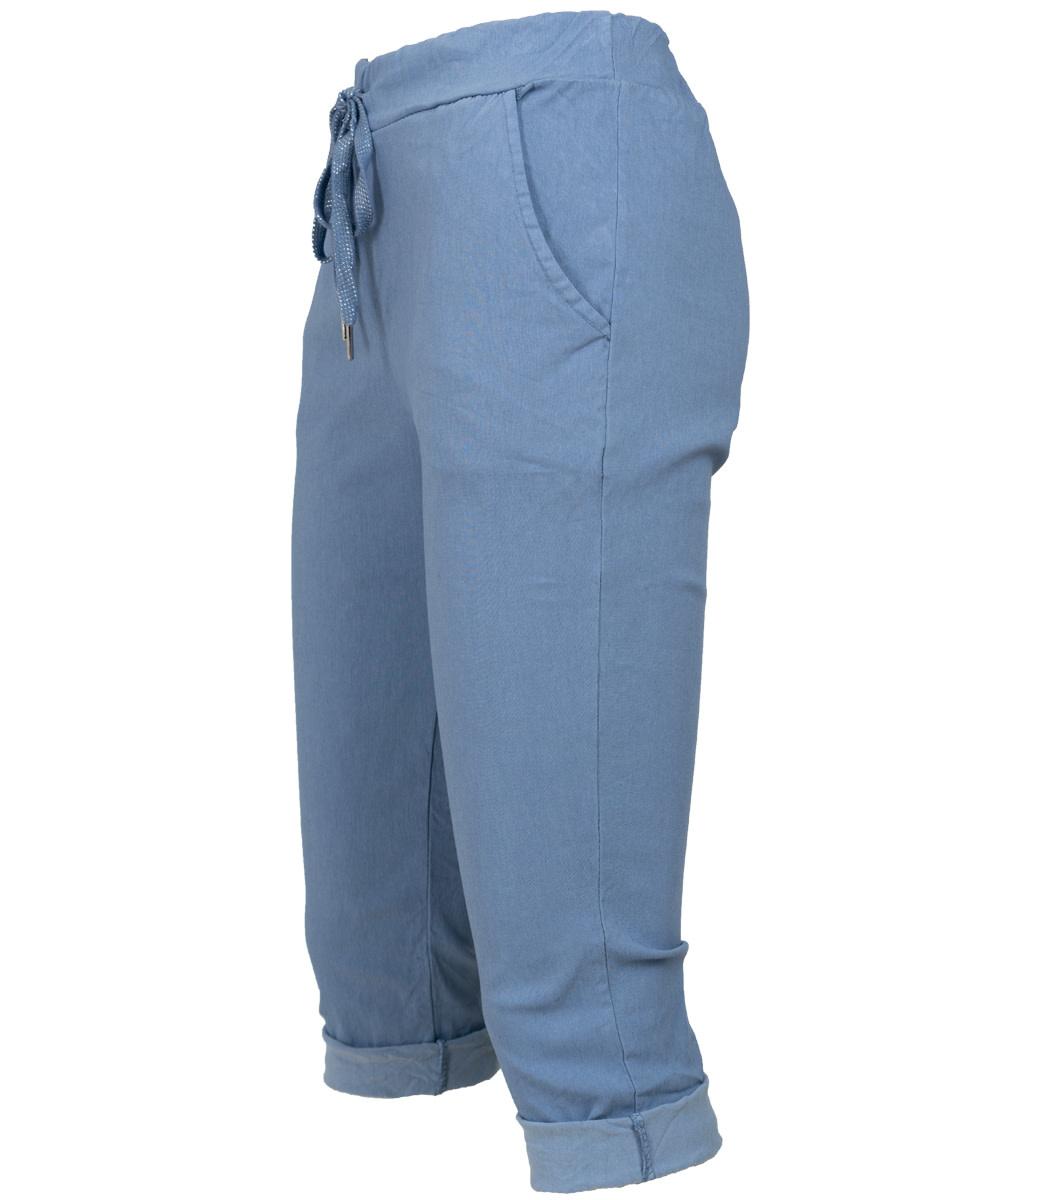 Wannahavesfashion Capri jeansblauw Cor